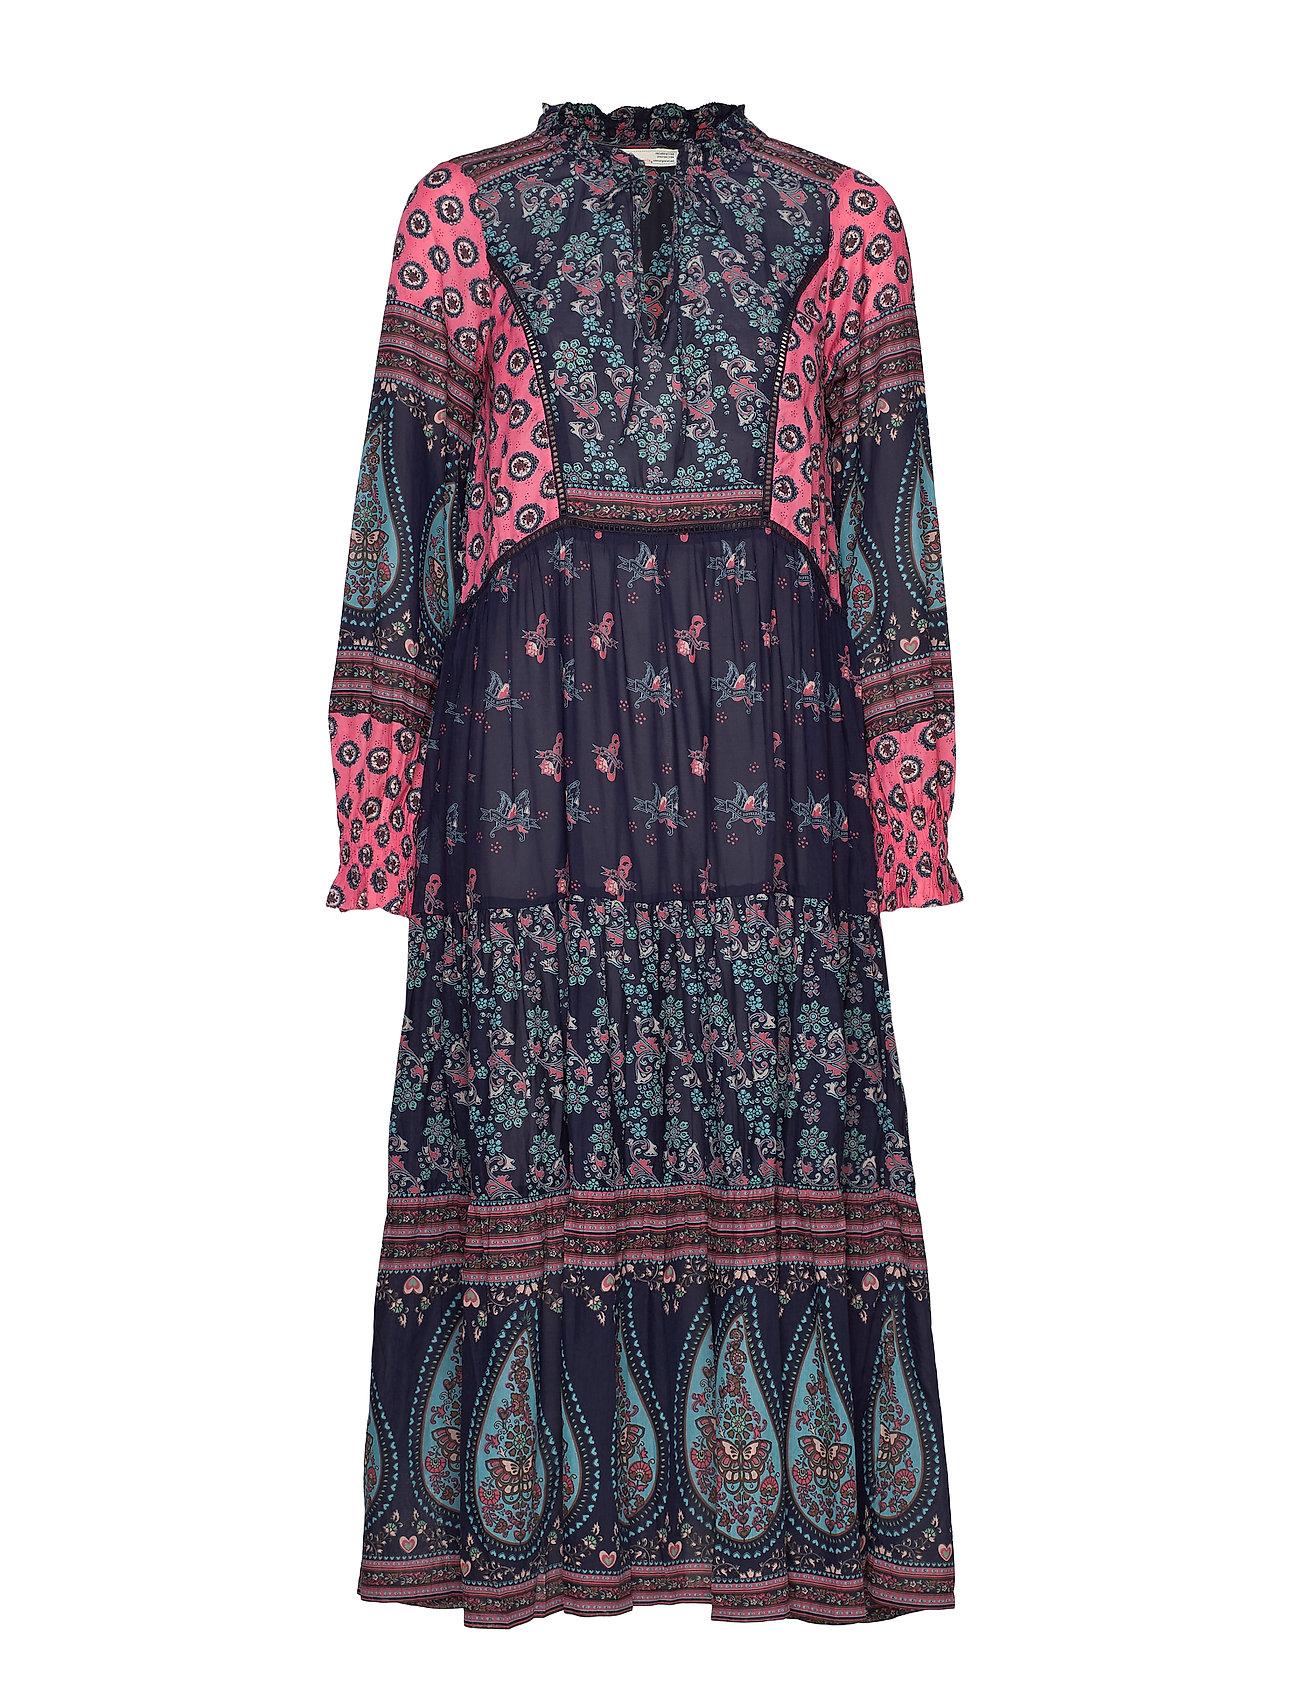 ODD MOLLY La Vie Boheme Dress - DARK BLUE